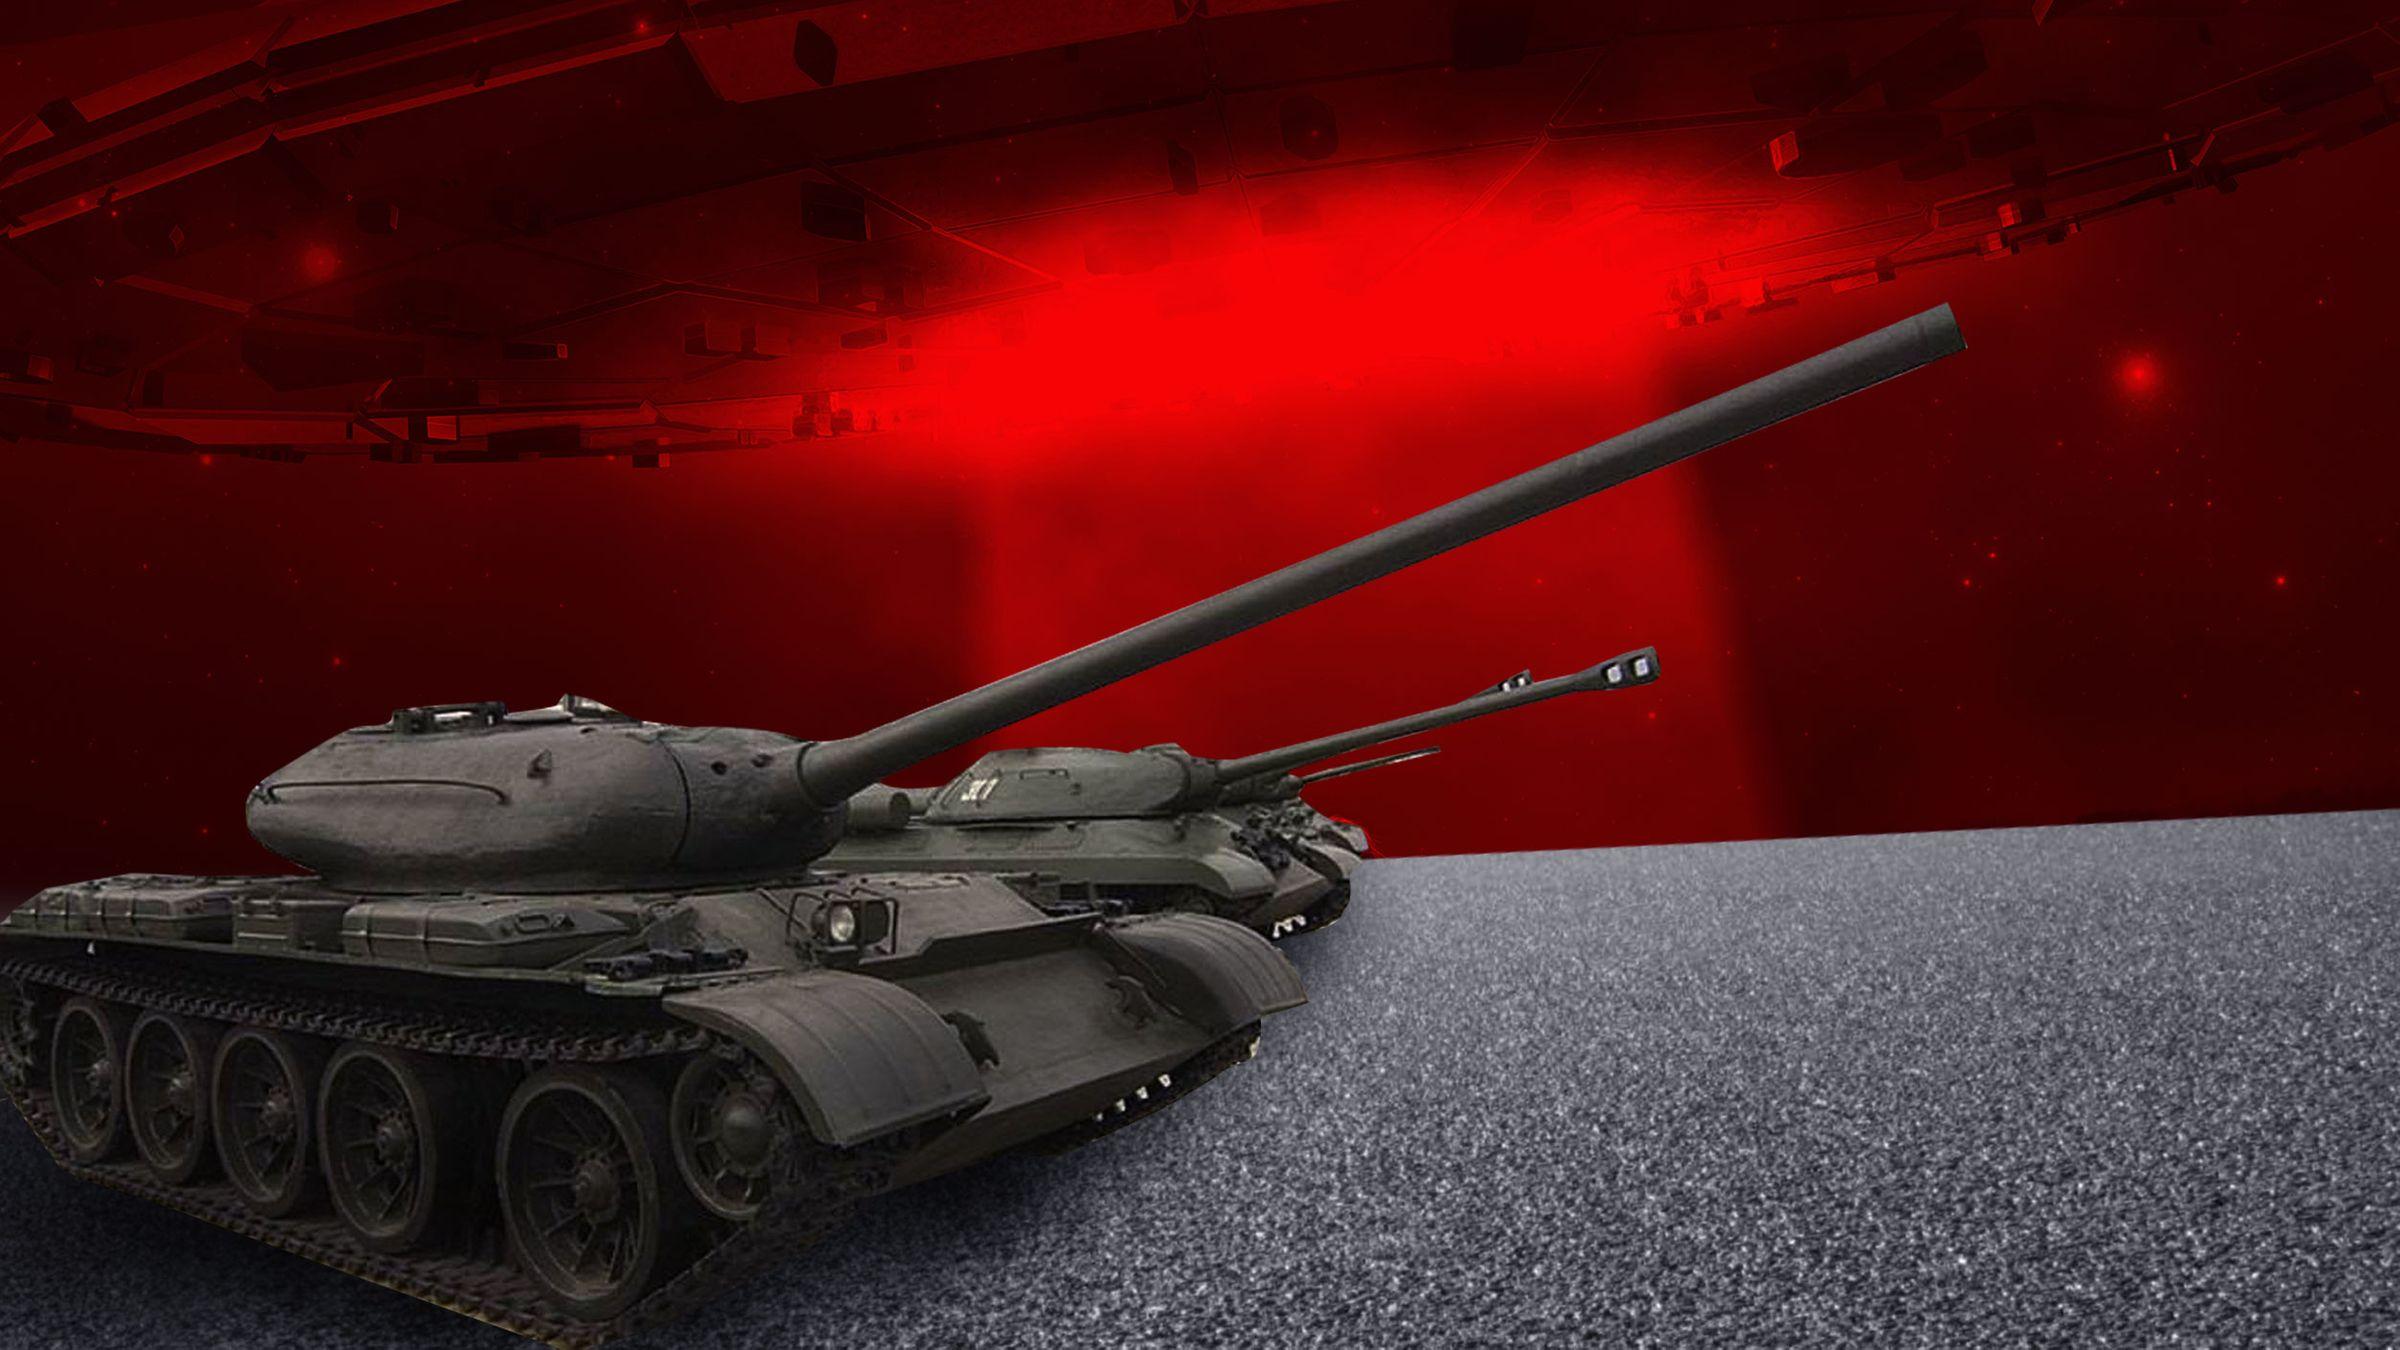 "<p>Коллаж LIFE. Фото © Shutterstock, <a href=""https://ru.wikipedia.org/wiki/%D0%A2-54#/media/%D0%A4%D0%B0%D0%B9%D0%BB:Tank_T-54_in_Verkhnyaya_Pyshma.jpg"" target=""_blank"" rel=""noopener noreferrer"">Wikipedia</a></p>"